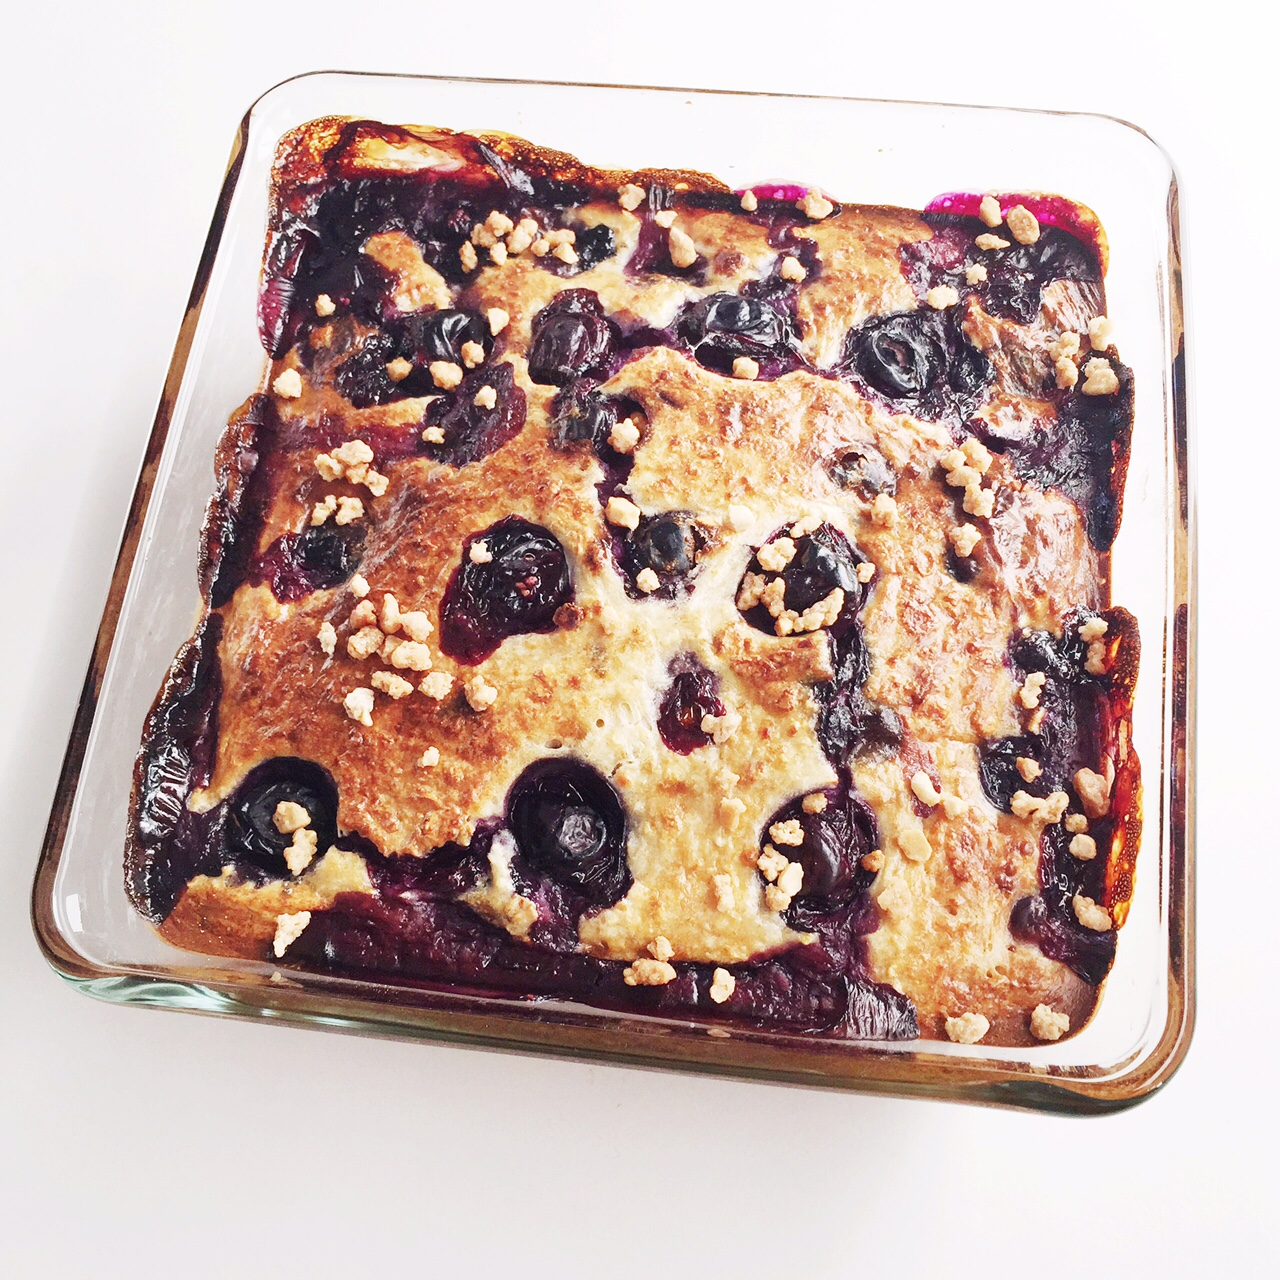 Baked Oatmeal II Recipes — Dishmaps